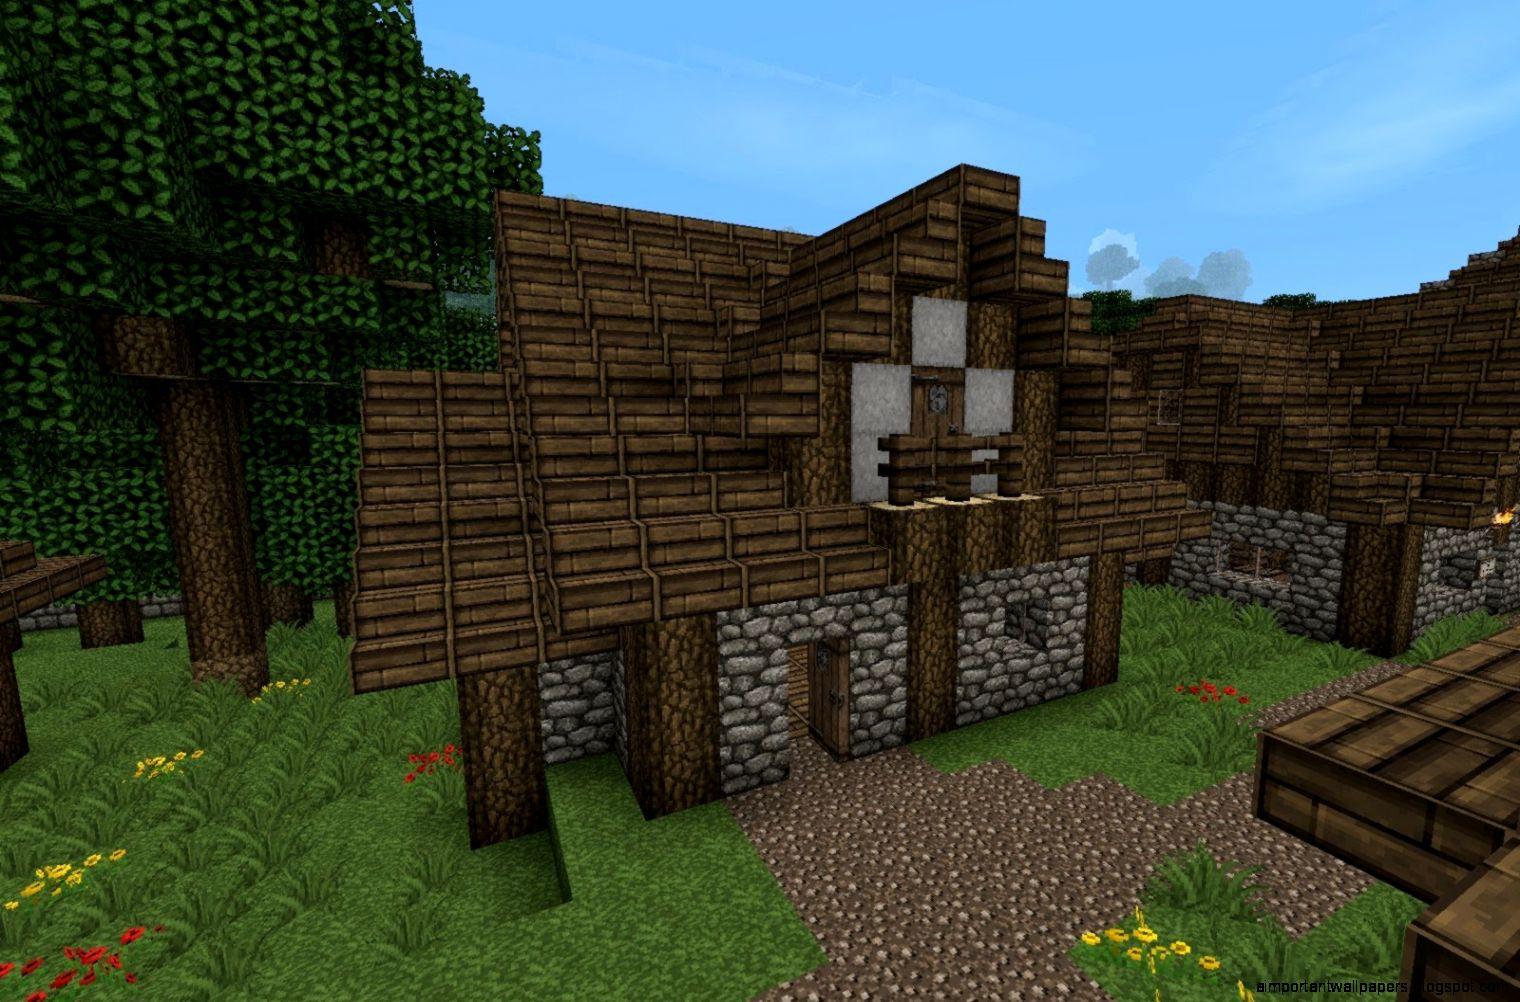 Medieval Minecraft House